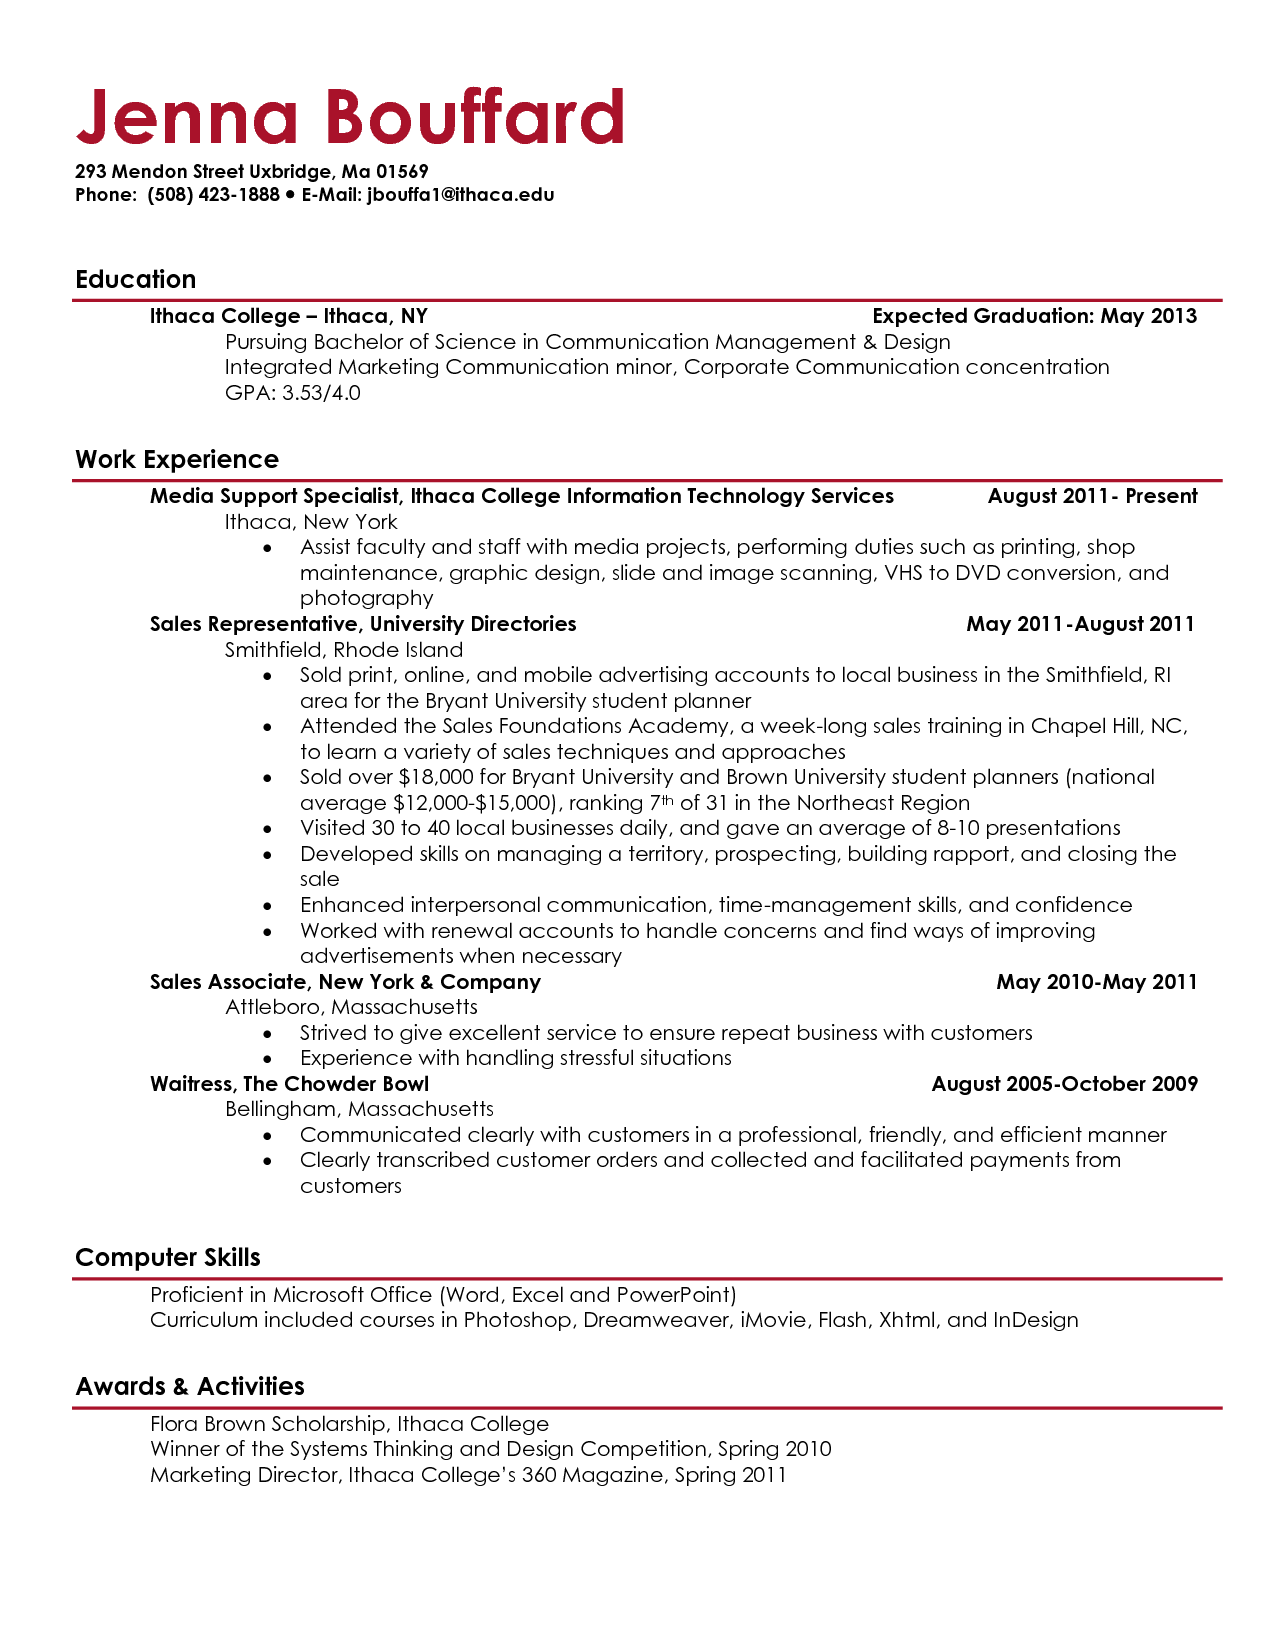 College Student Resume Example Sample http://.jobresume